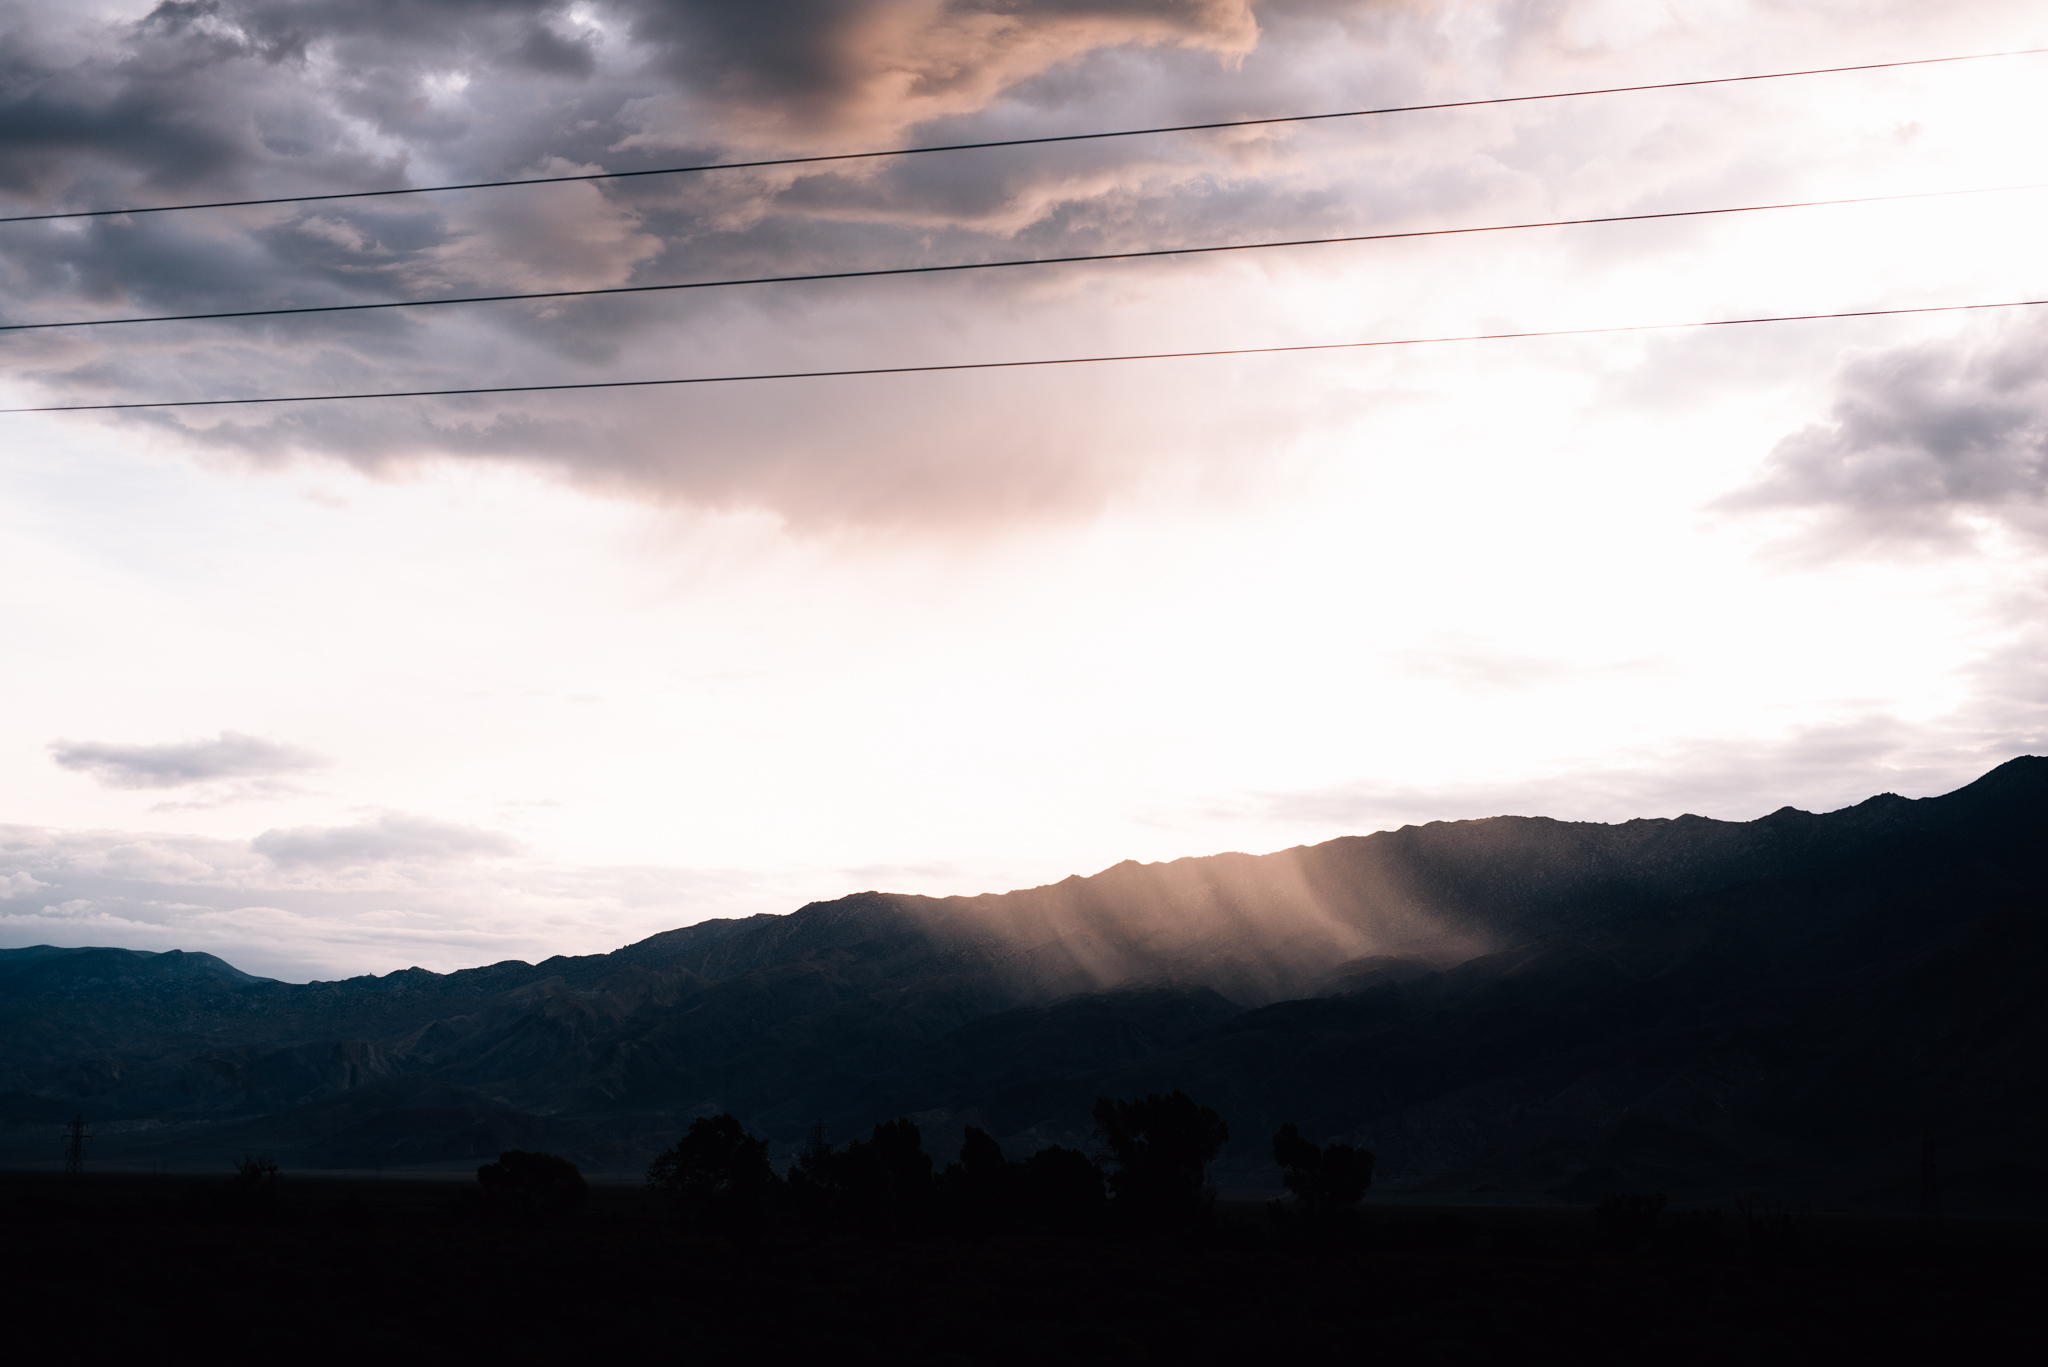 ©The Ryans Photography - Los Angeles Travel - Tuolomne Meadows Yosemite-002.jpg